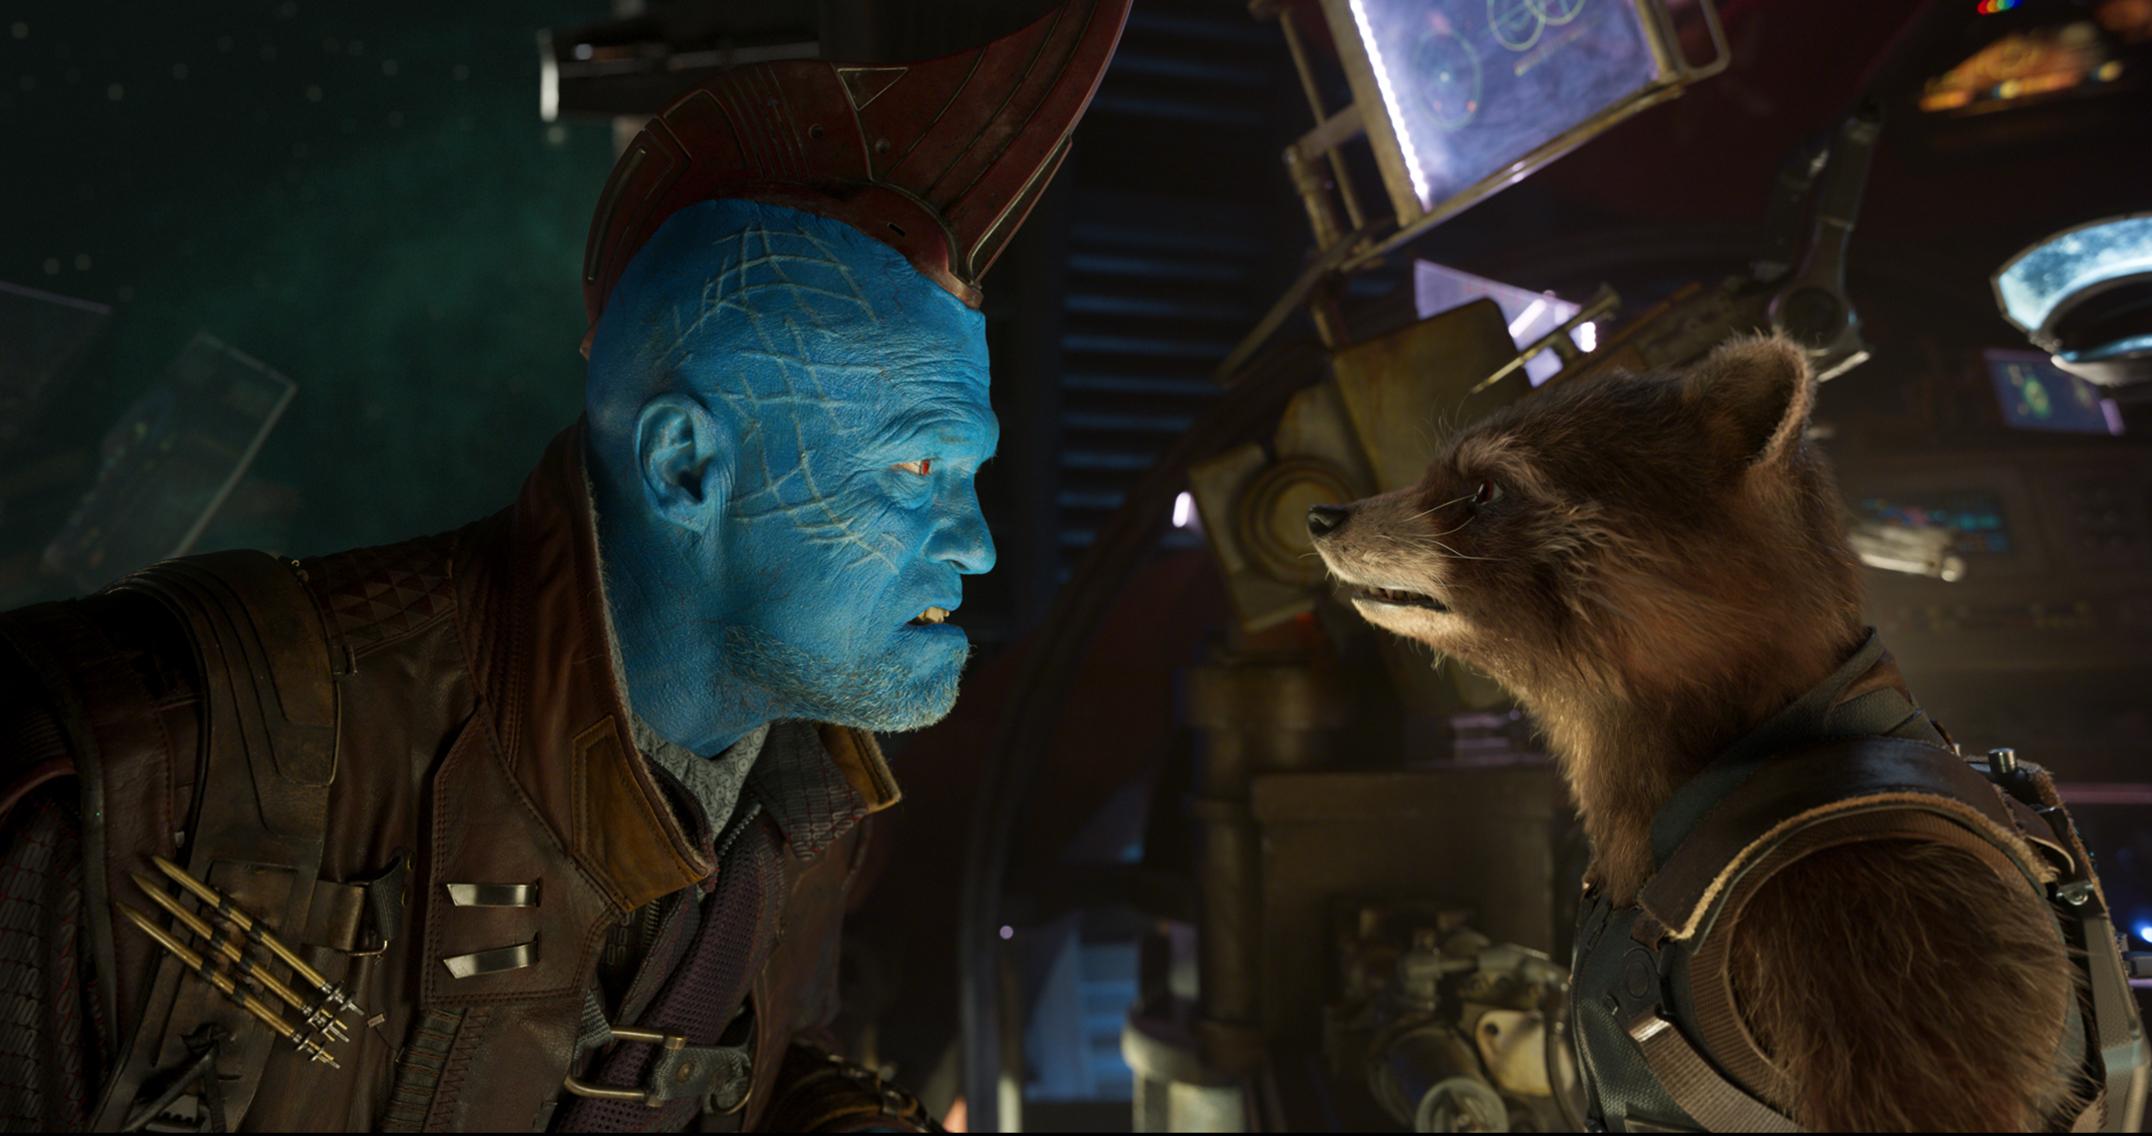 Yondu Udonta | Marvel Cinematic Universe Wiki | Fandom